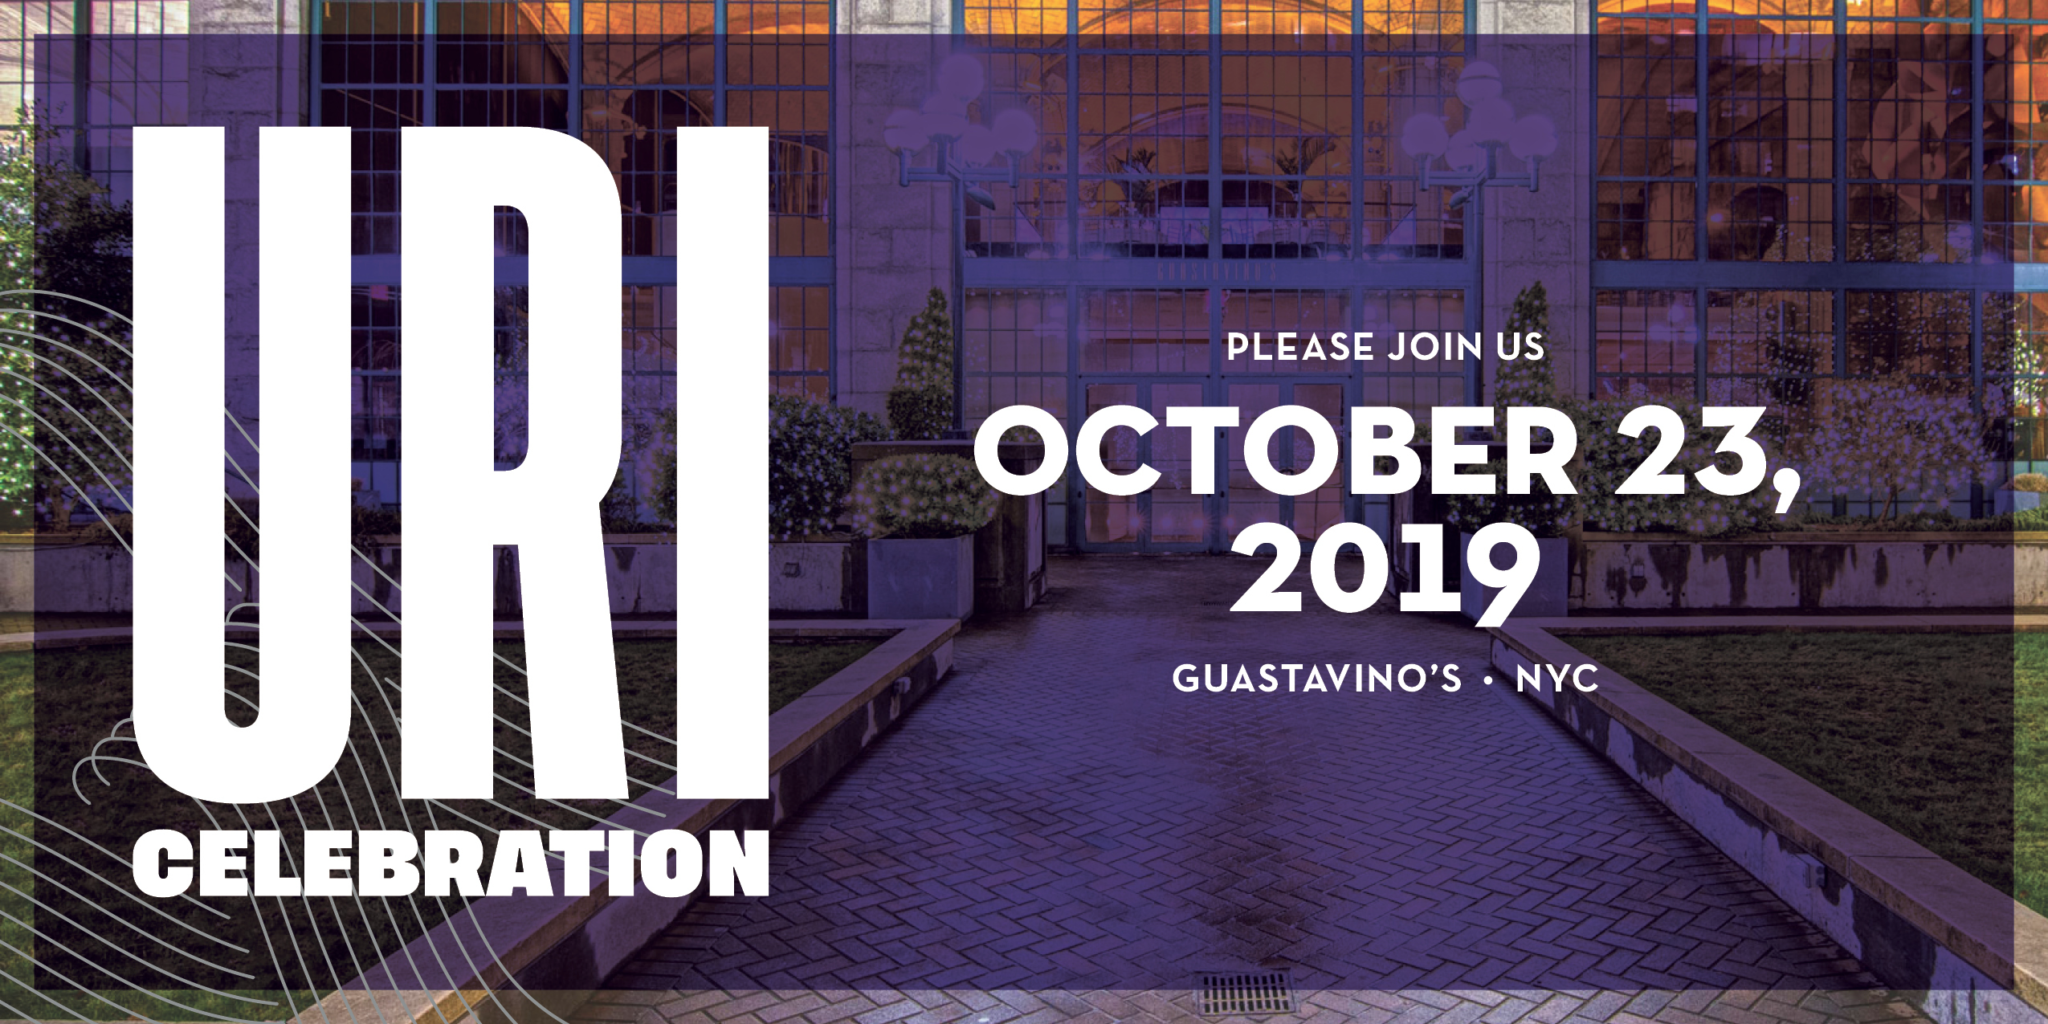 Please Join Us October 23, 2019. Guastavino's NYC